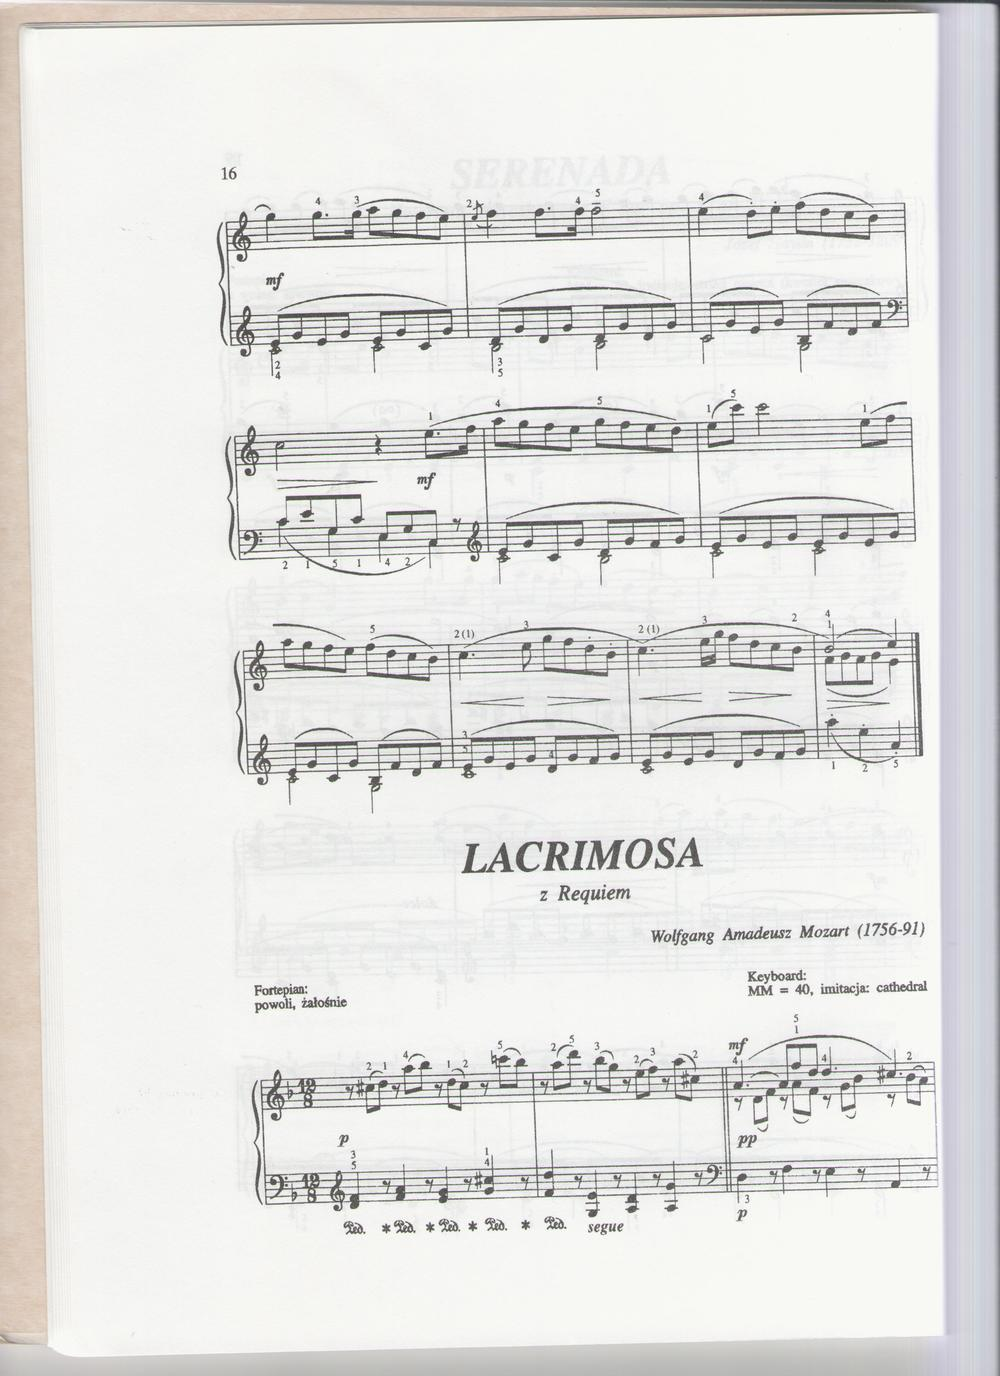 Lacrimosa_Requirem_Mozart_1